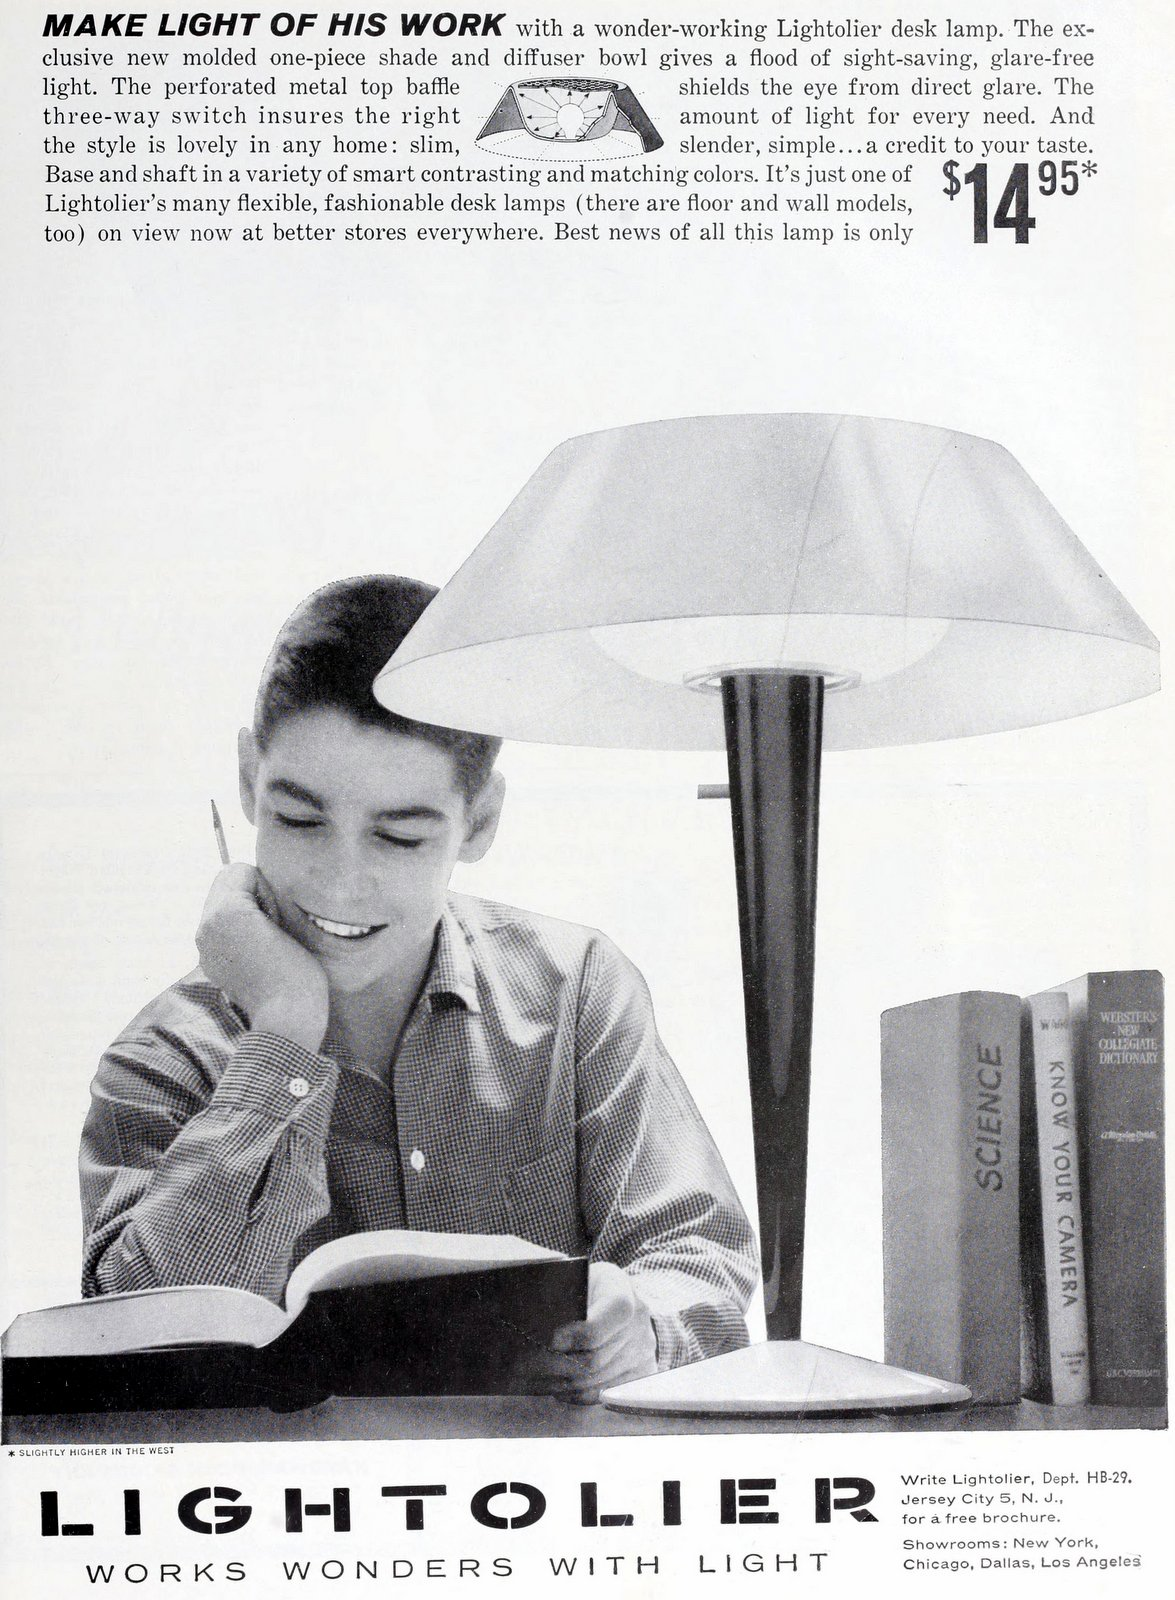 Mod retro Lightolier lamp (1959)